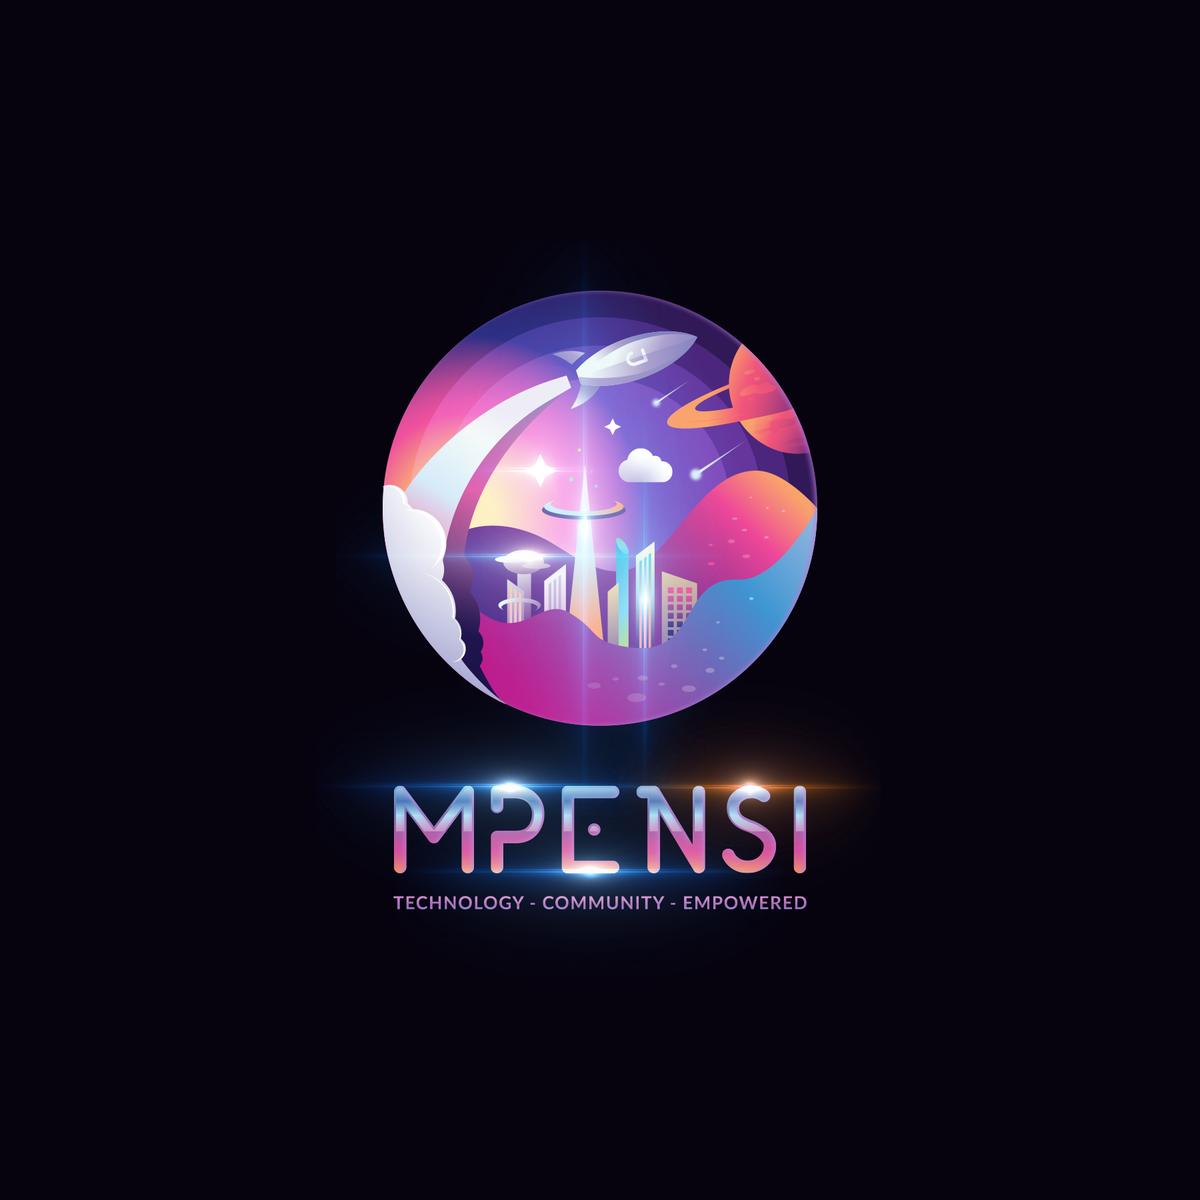 Mpensi